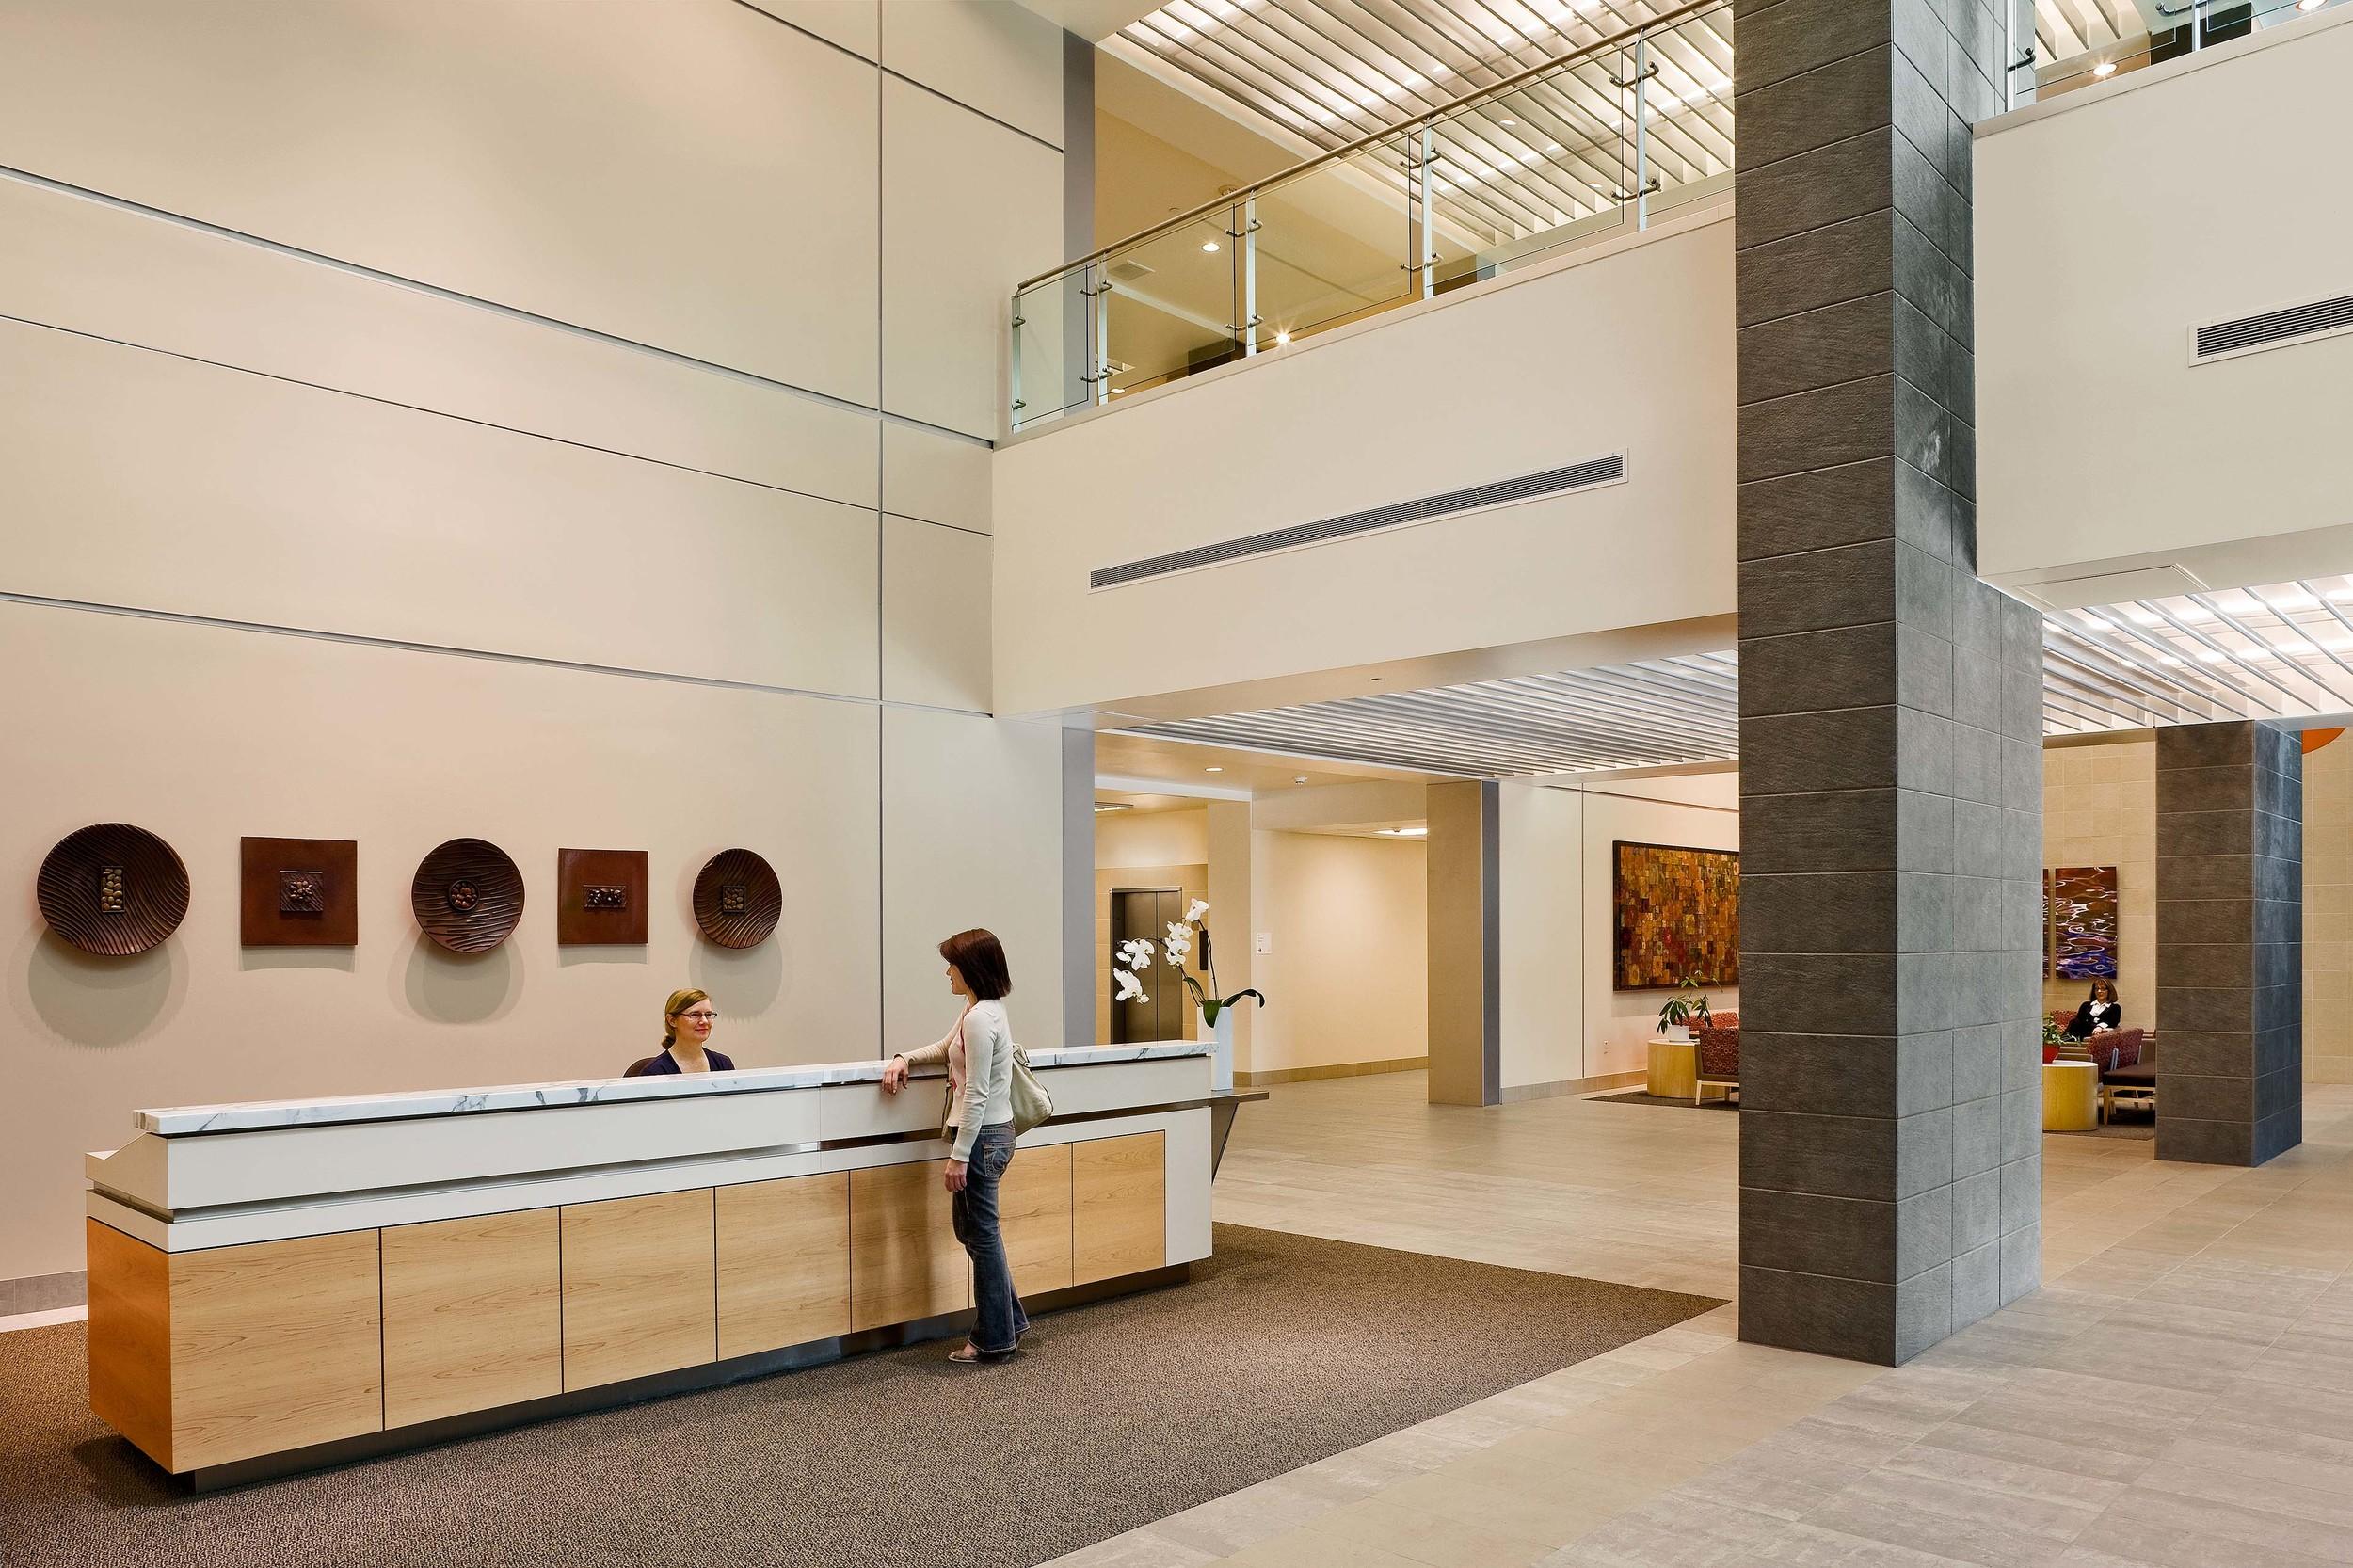 Kaiser Permanente Panorama City Medical Center